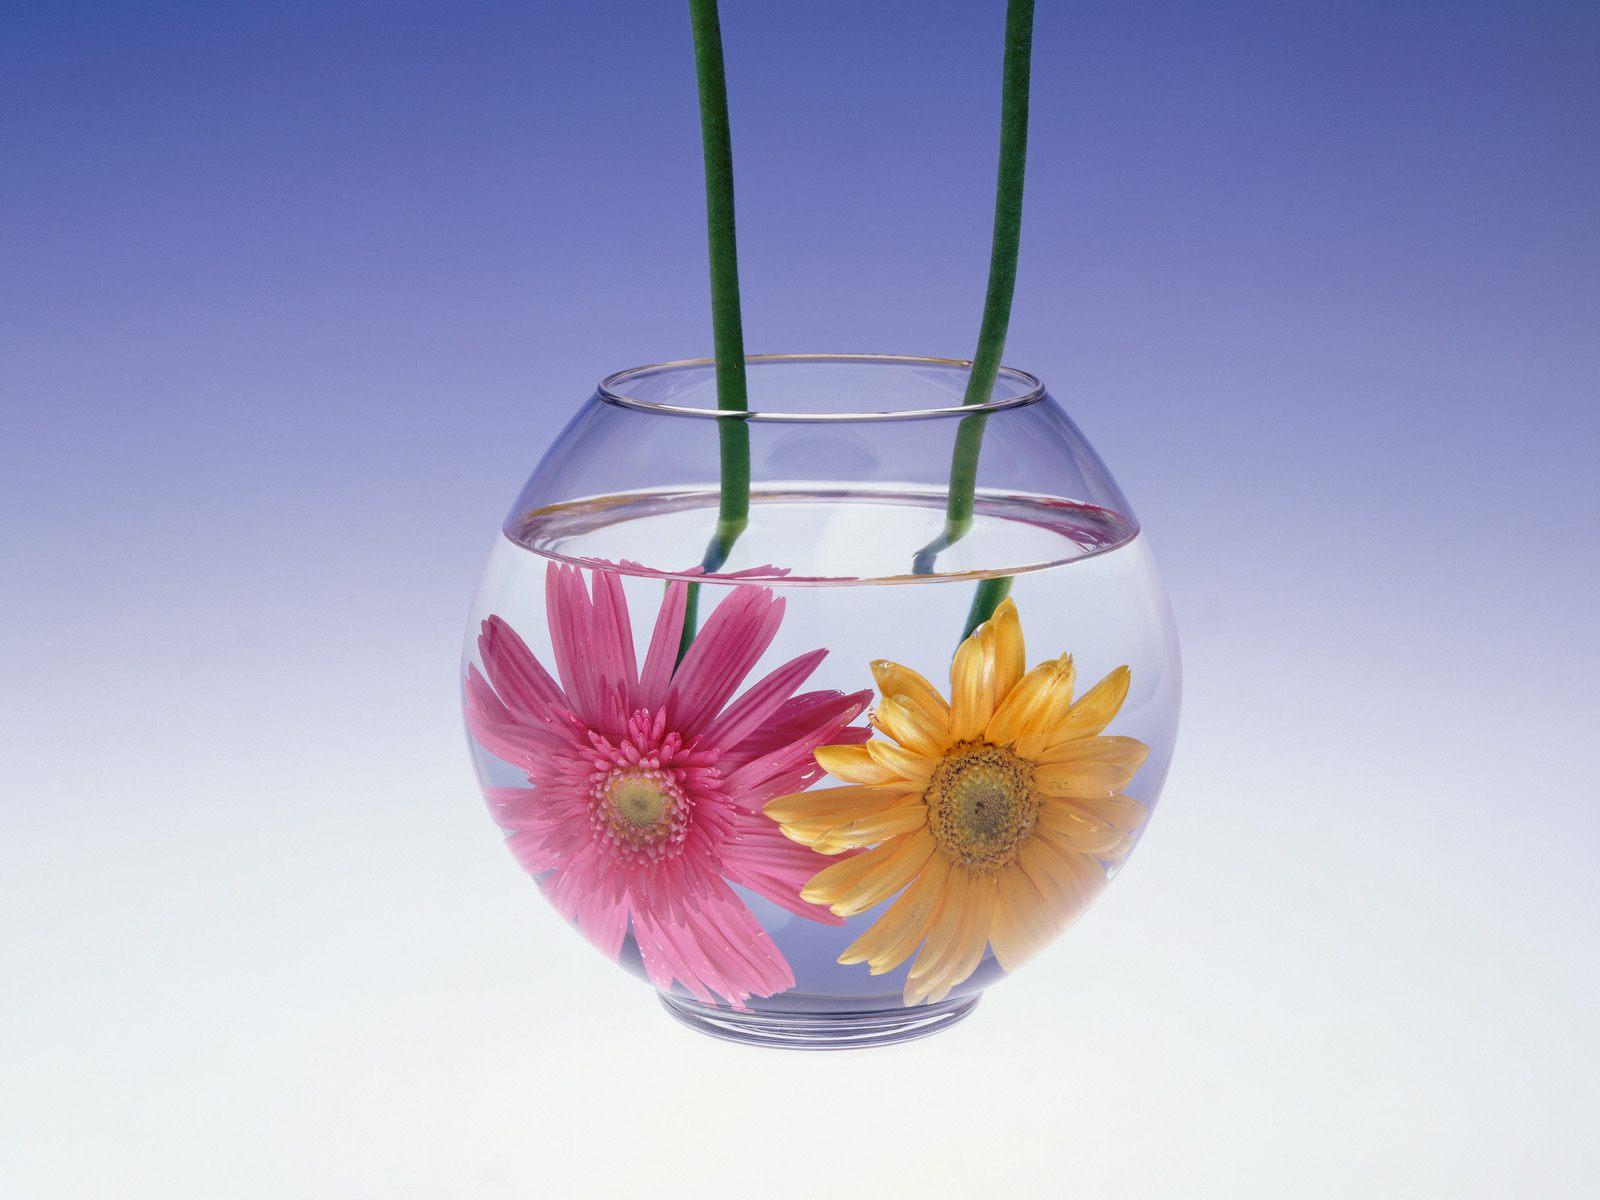 Flowers In Glass - Flowers In Glass